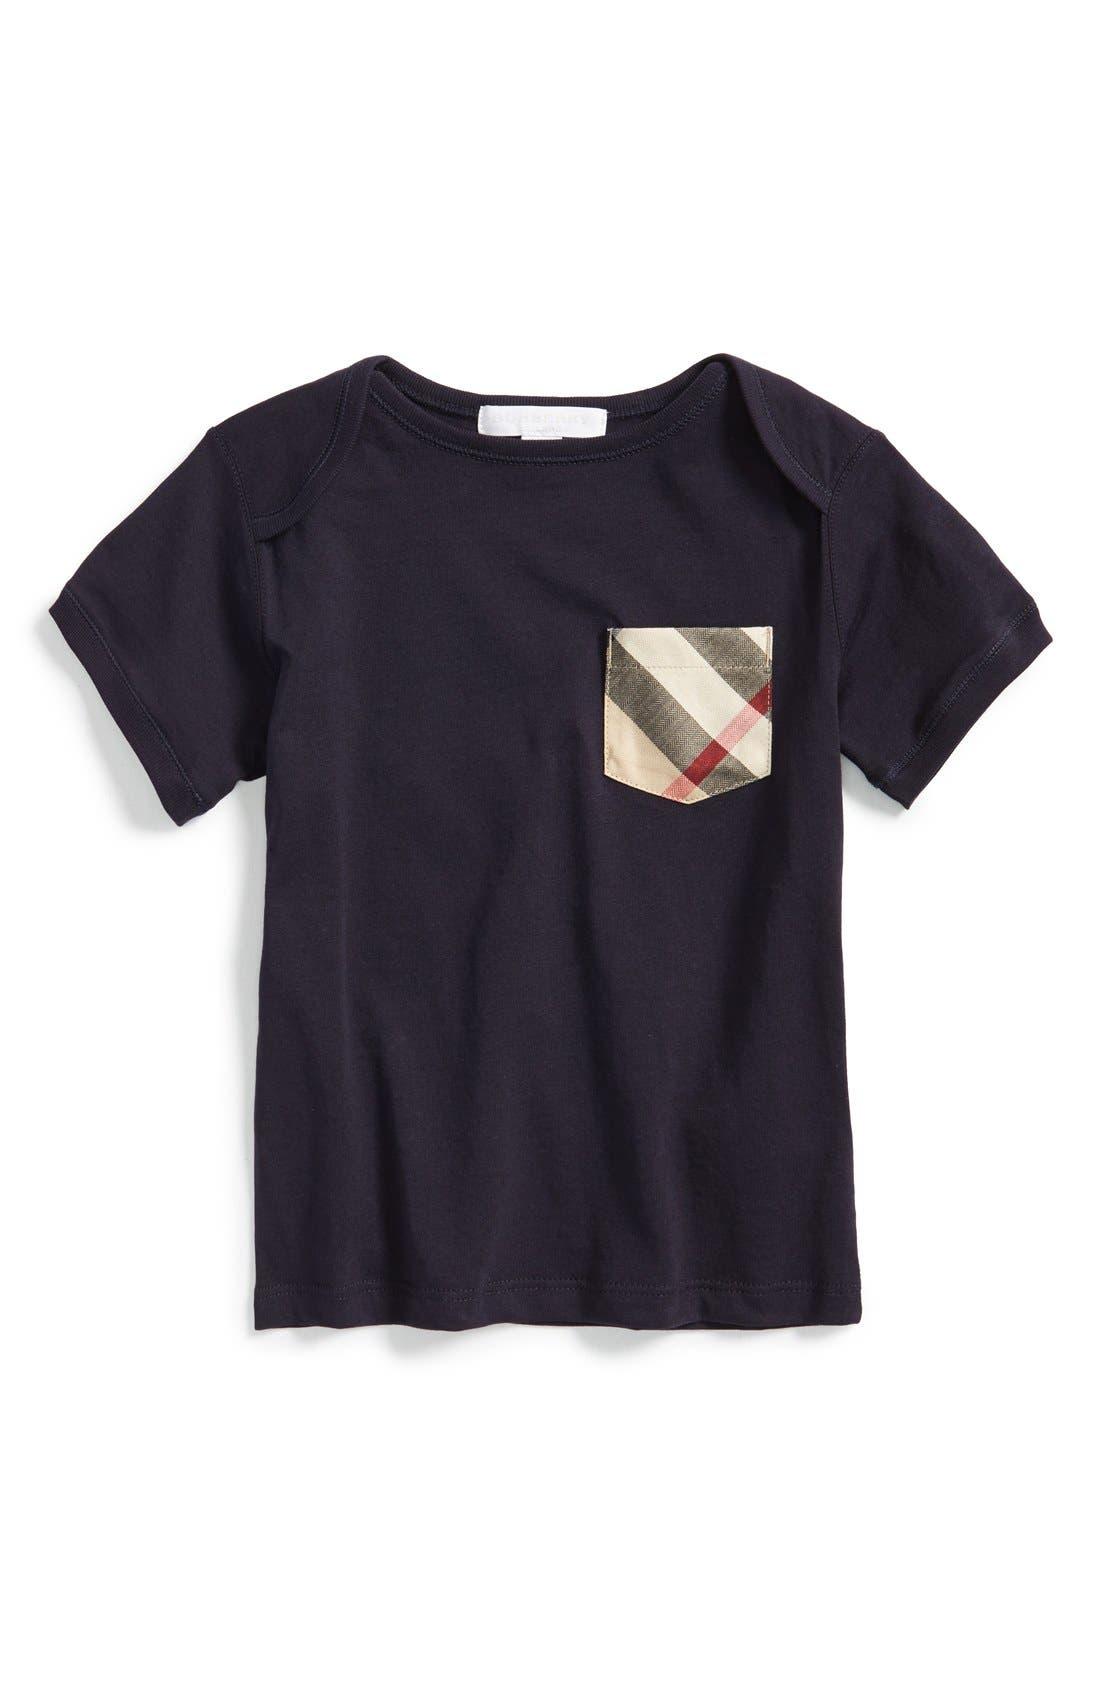 Burberry 'Callum' Check Print Chest Pocket Cotton T-Shirt (Toddler Boys)